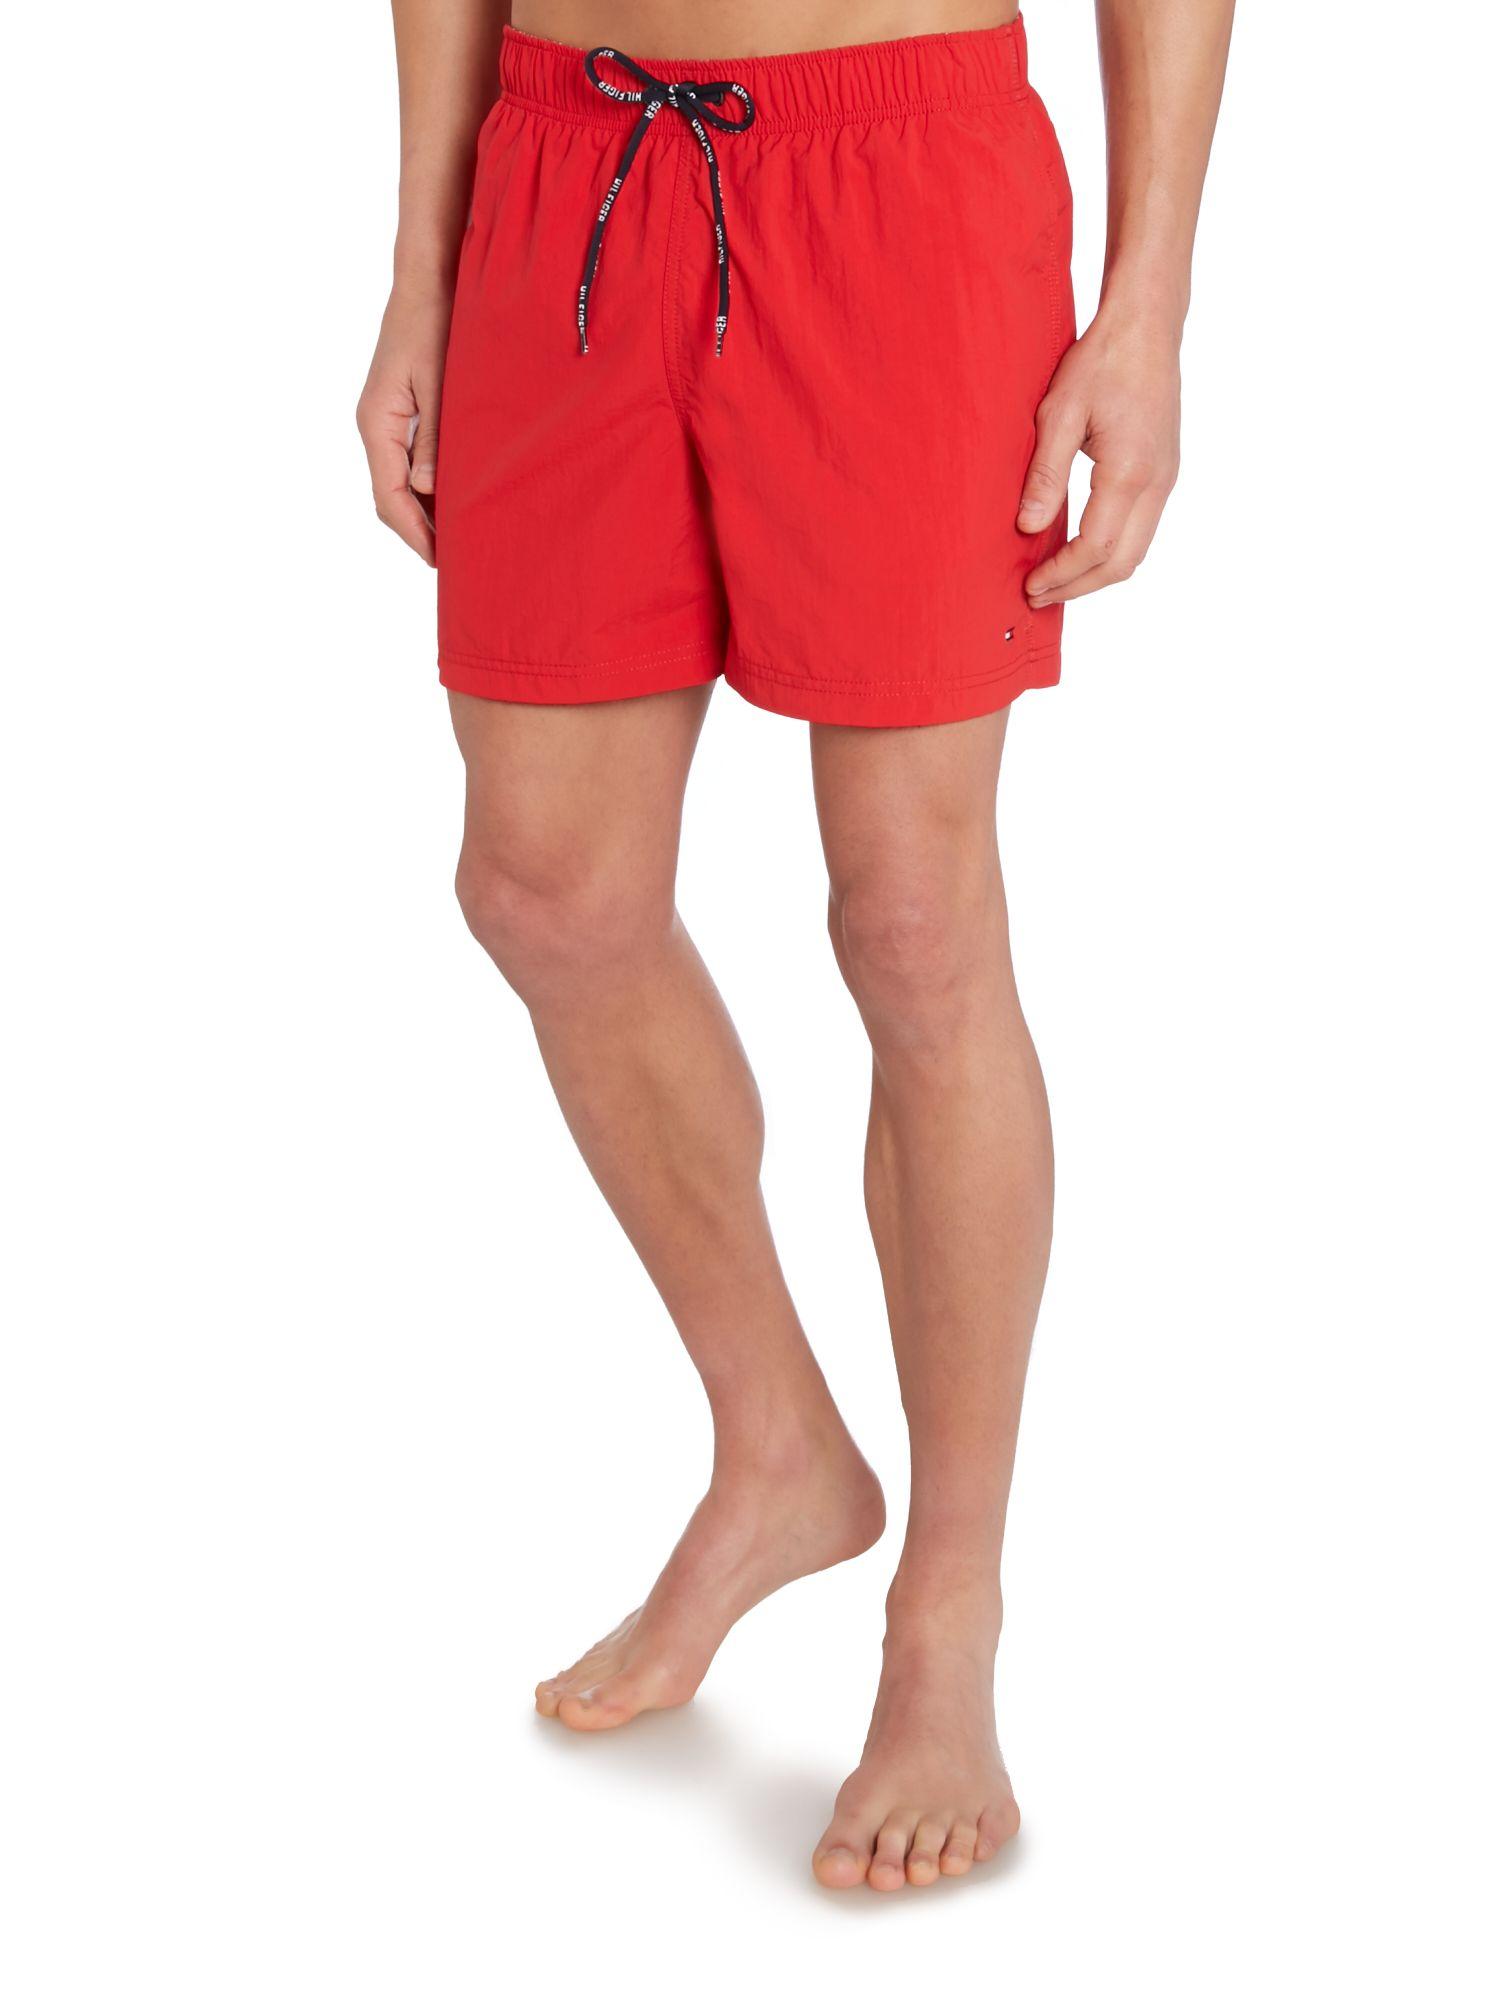 lyst tommy hilfiger classic swim short in red for men. Black Bedroom Furniture Sets. Home Design Ideas